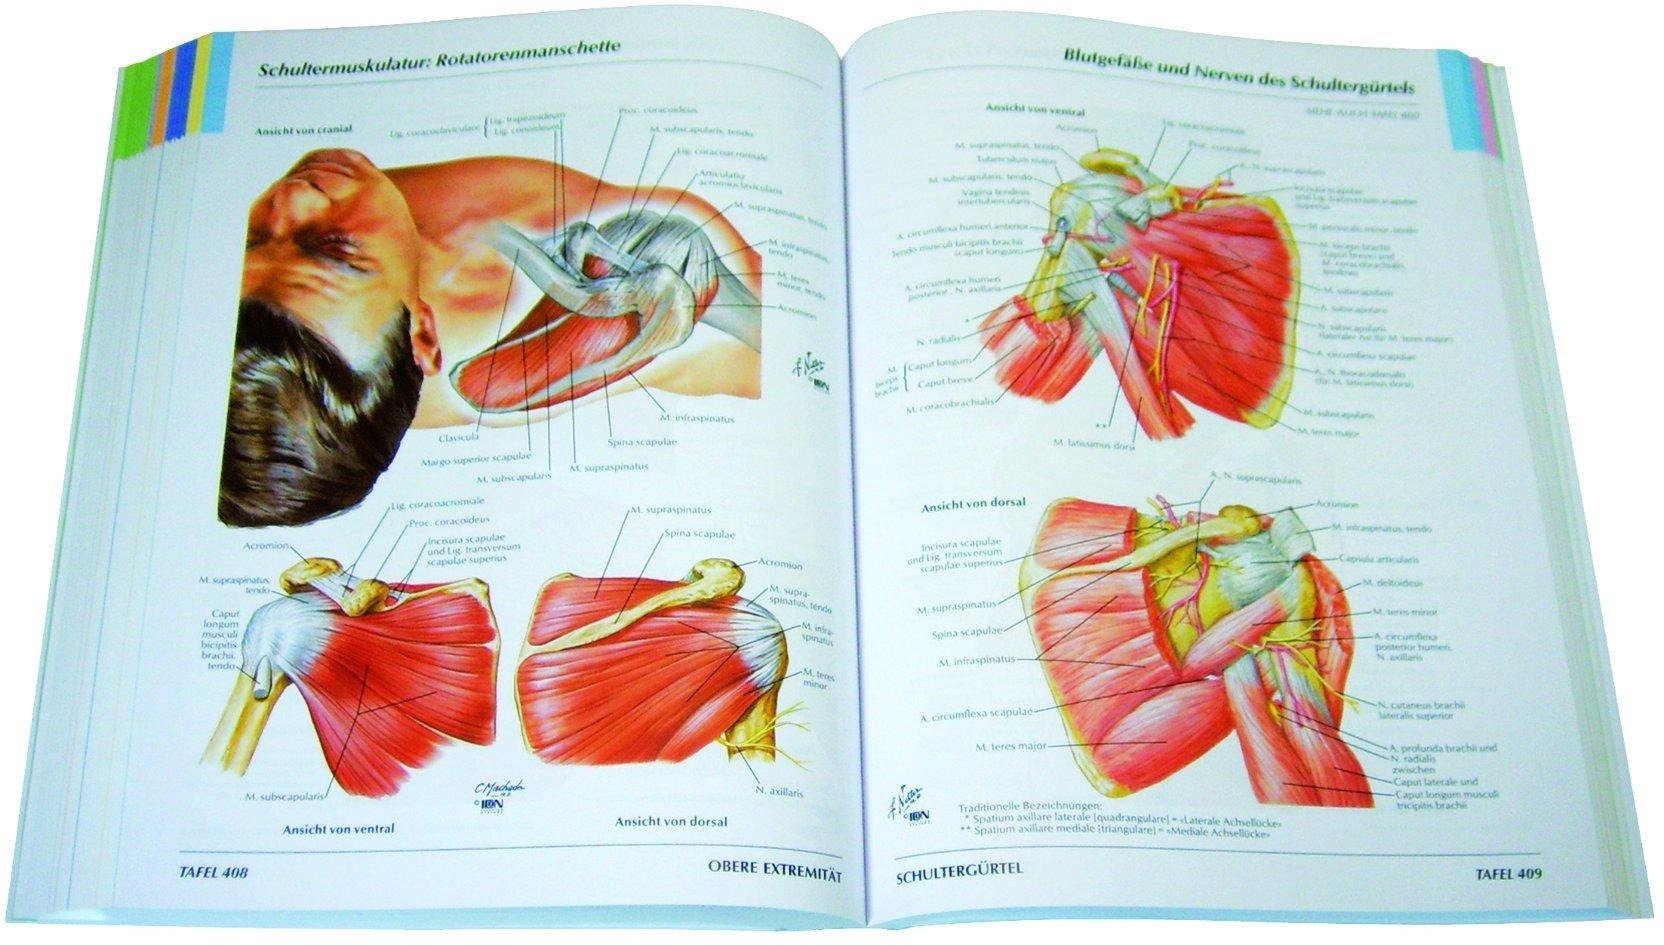 Netter - Atlas der Anatomie: Amazon.de: Bücher